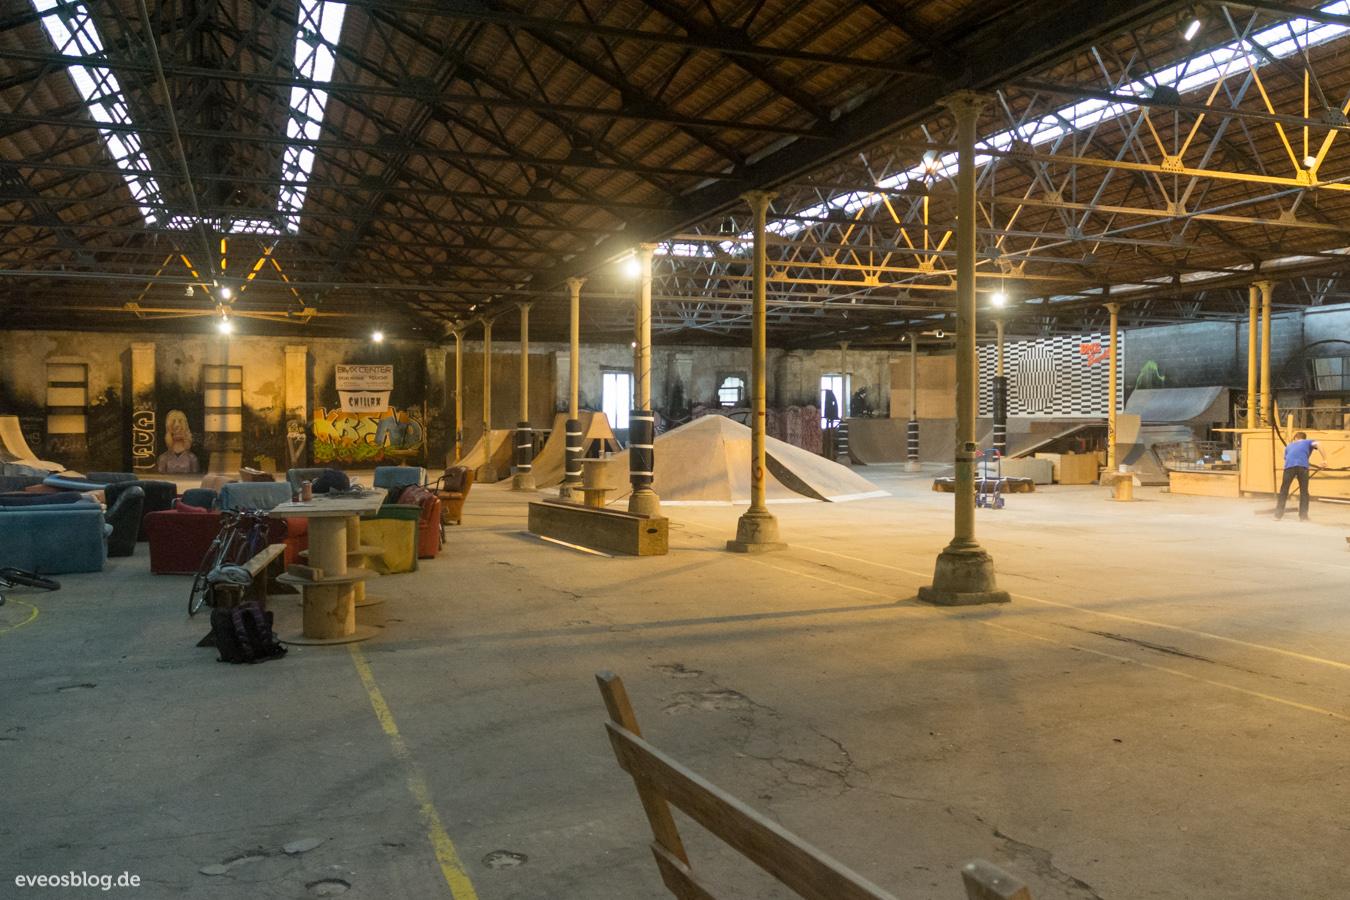 Bordeaux historische mauern voller design moderner kunst kultur tip - Location hangar bordeaux ...